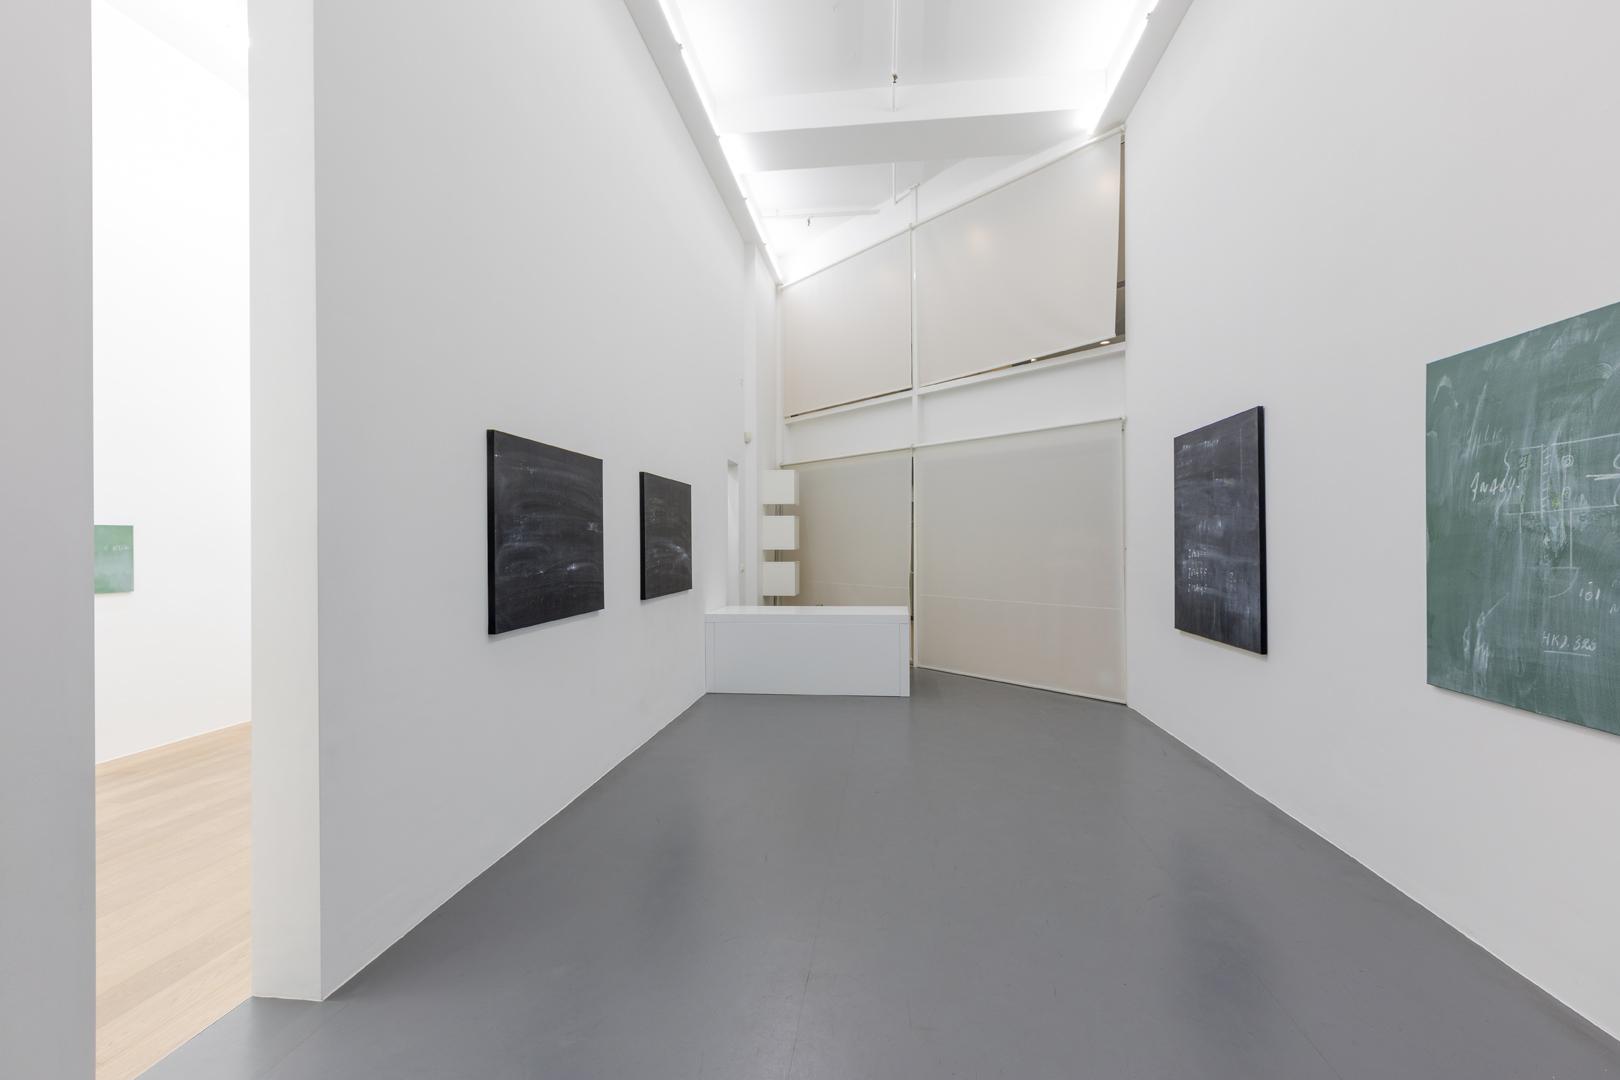 Alain Bornain. Blackboards Exhibition view. Room 1